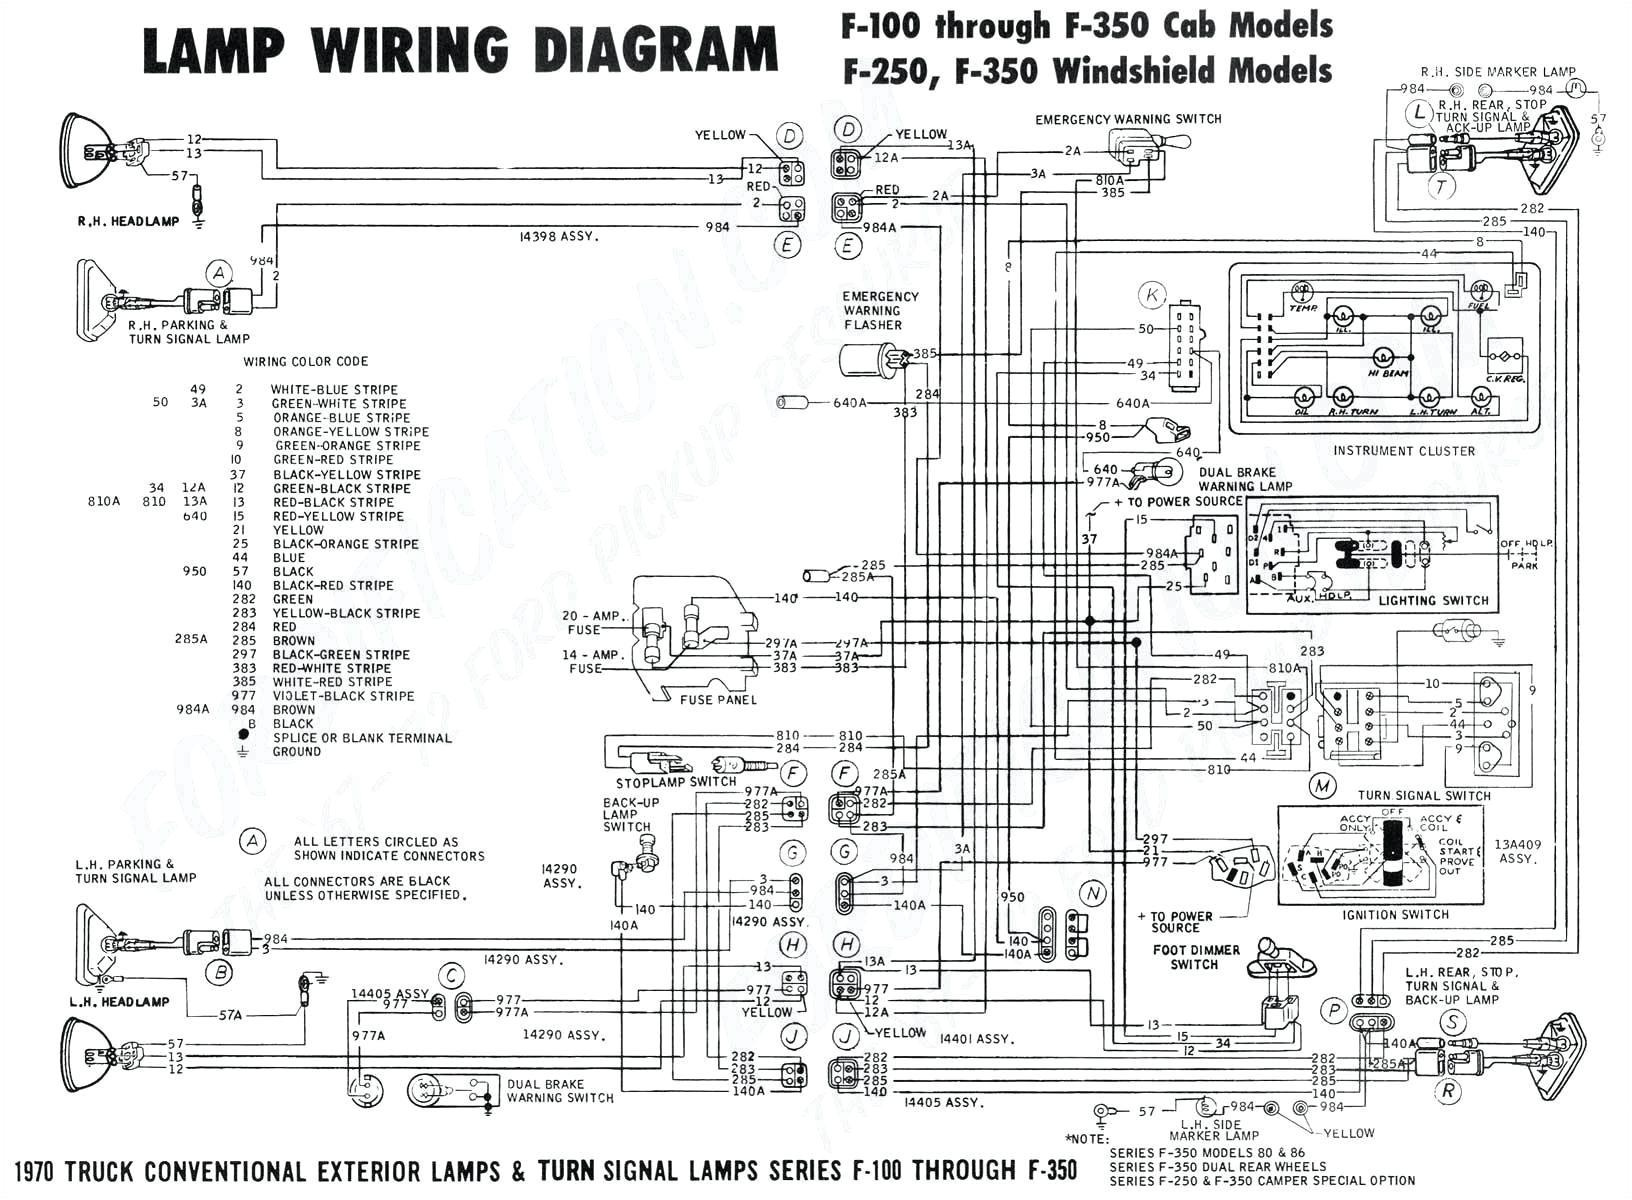 rv battery hookup diagram inspirational travel trailer battery wiring diagram book wiring diagram for rv